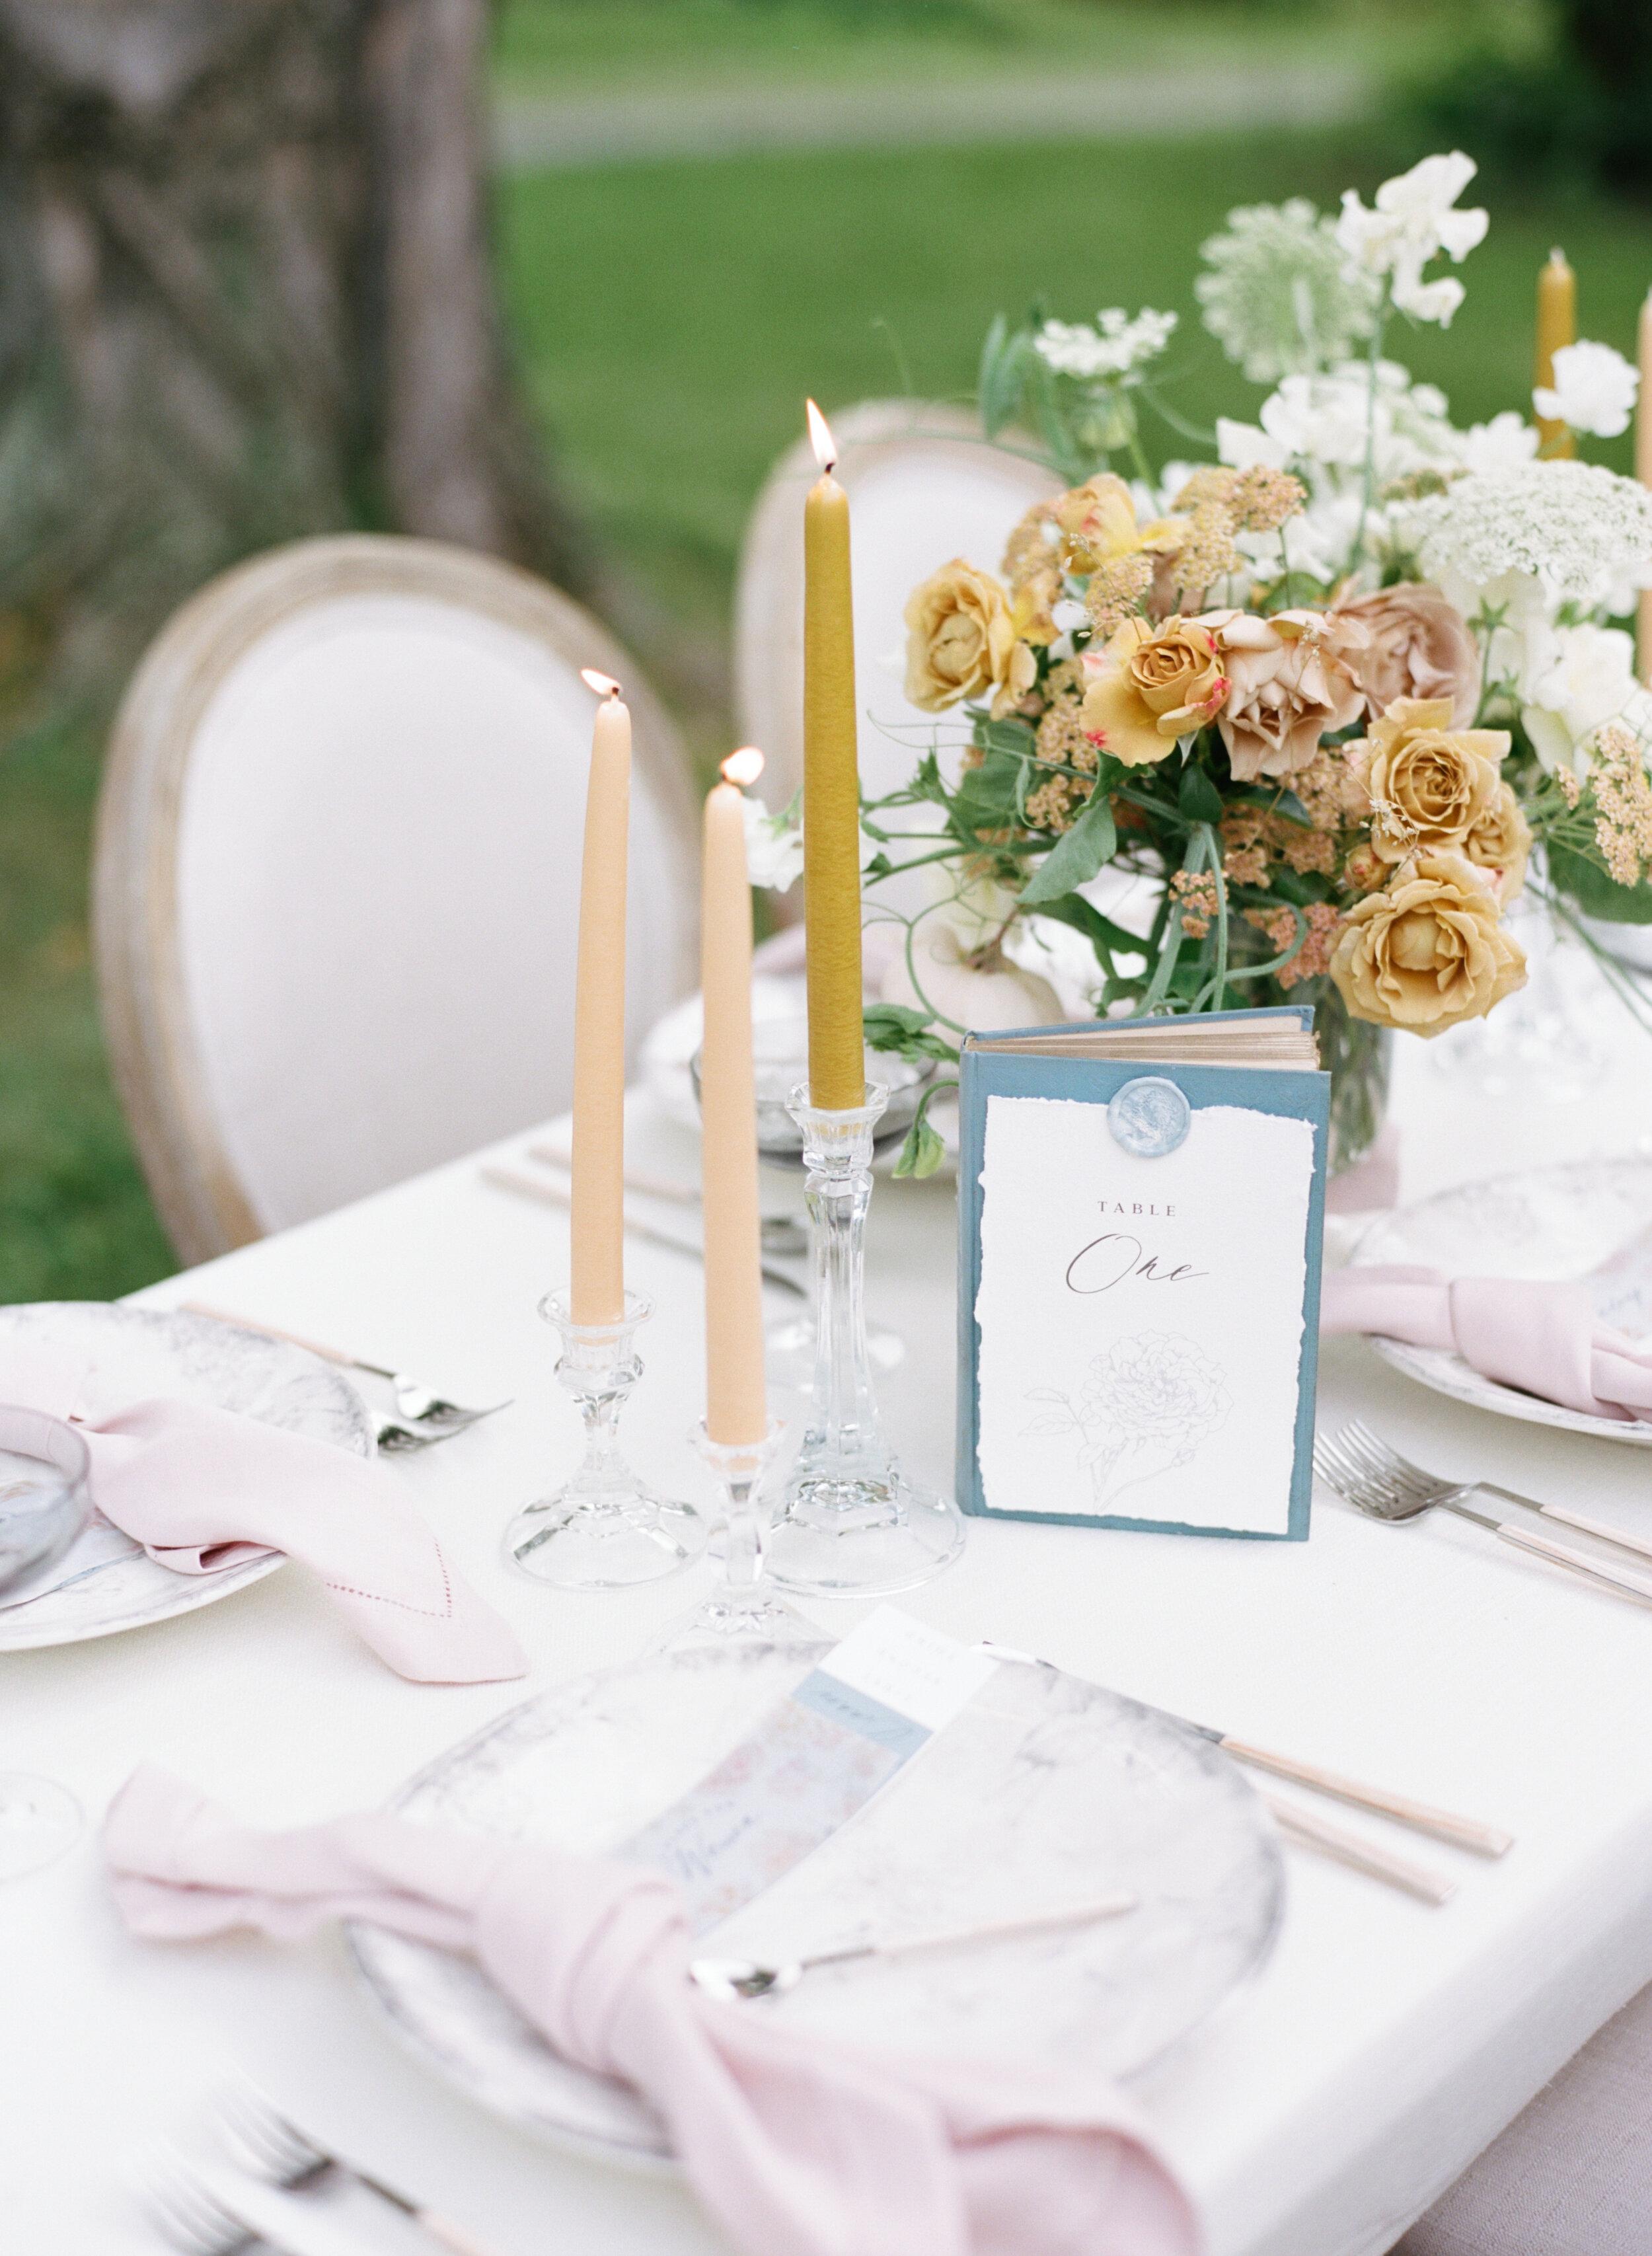 alexandra-meseke-understated-soft-luxury-wedding-upstate-ny_0123.jpg